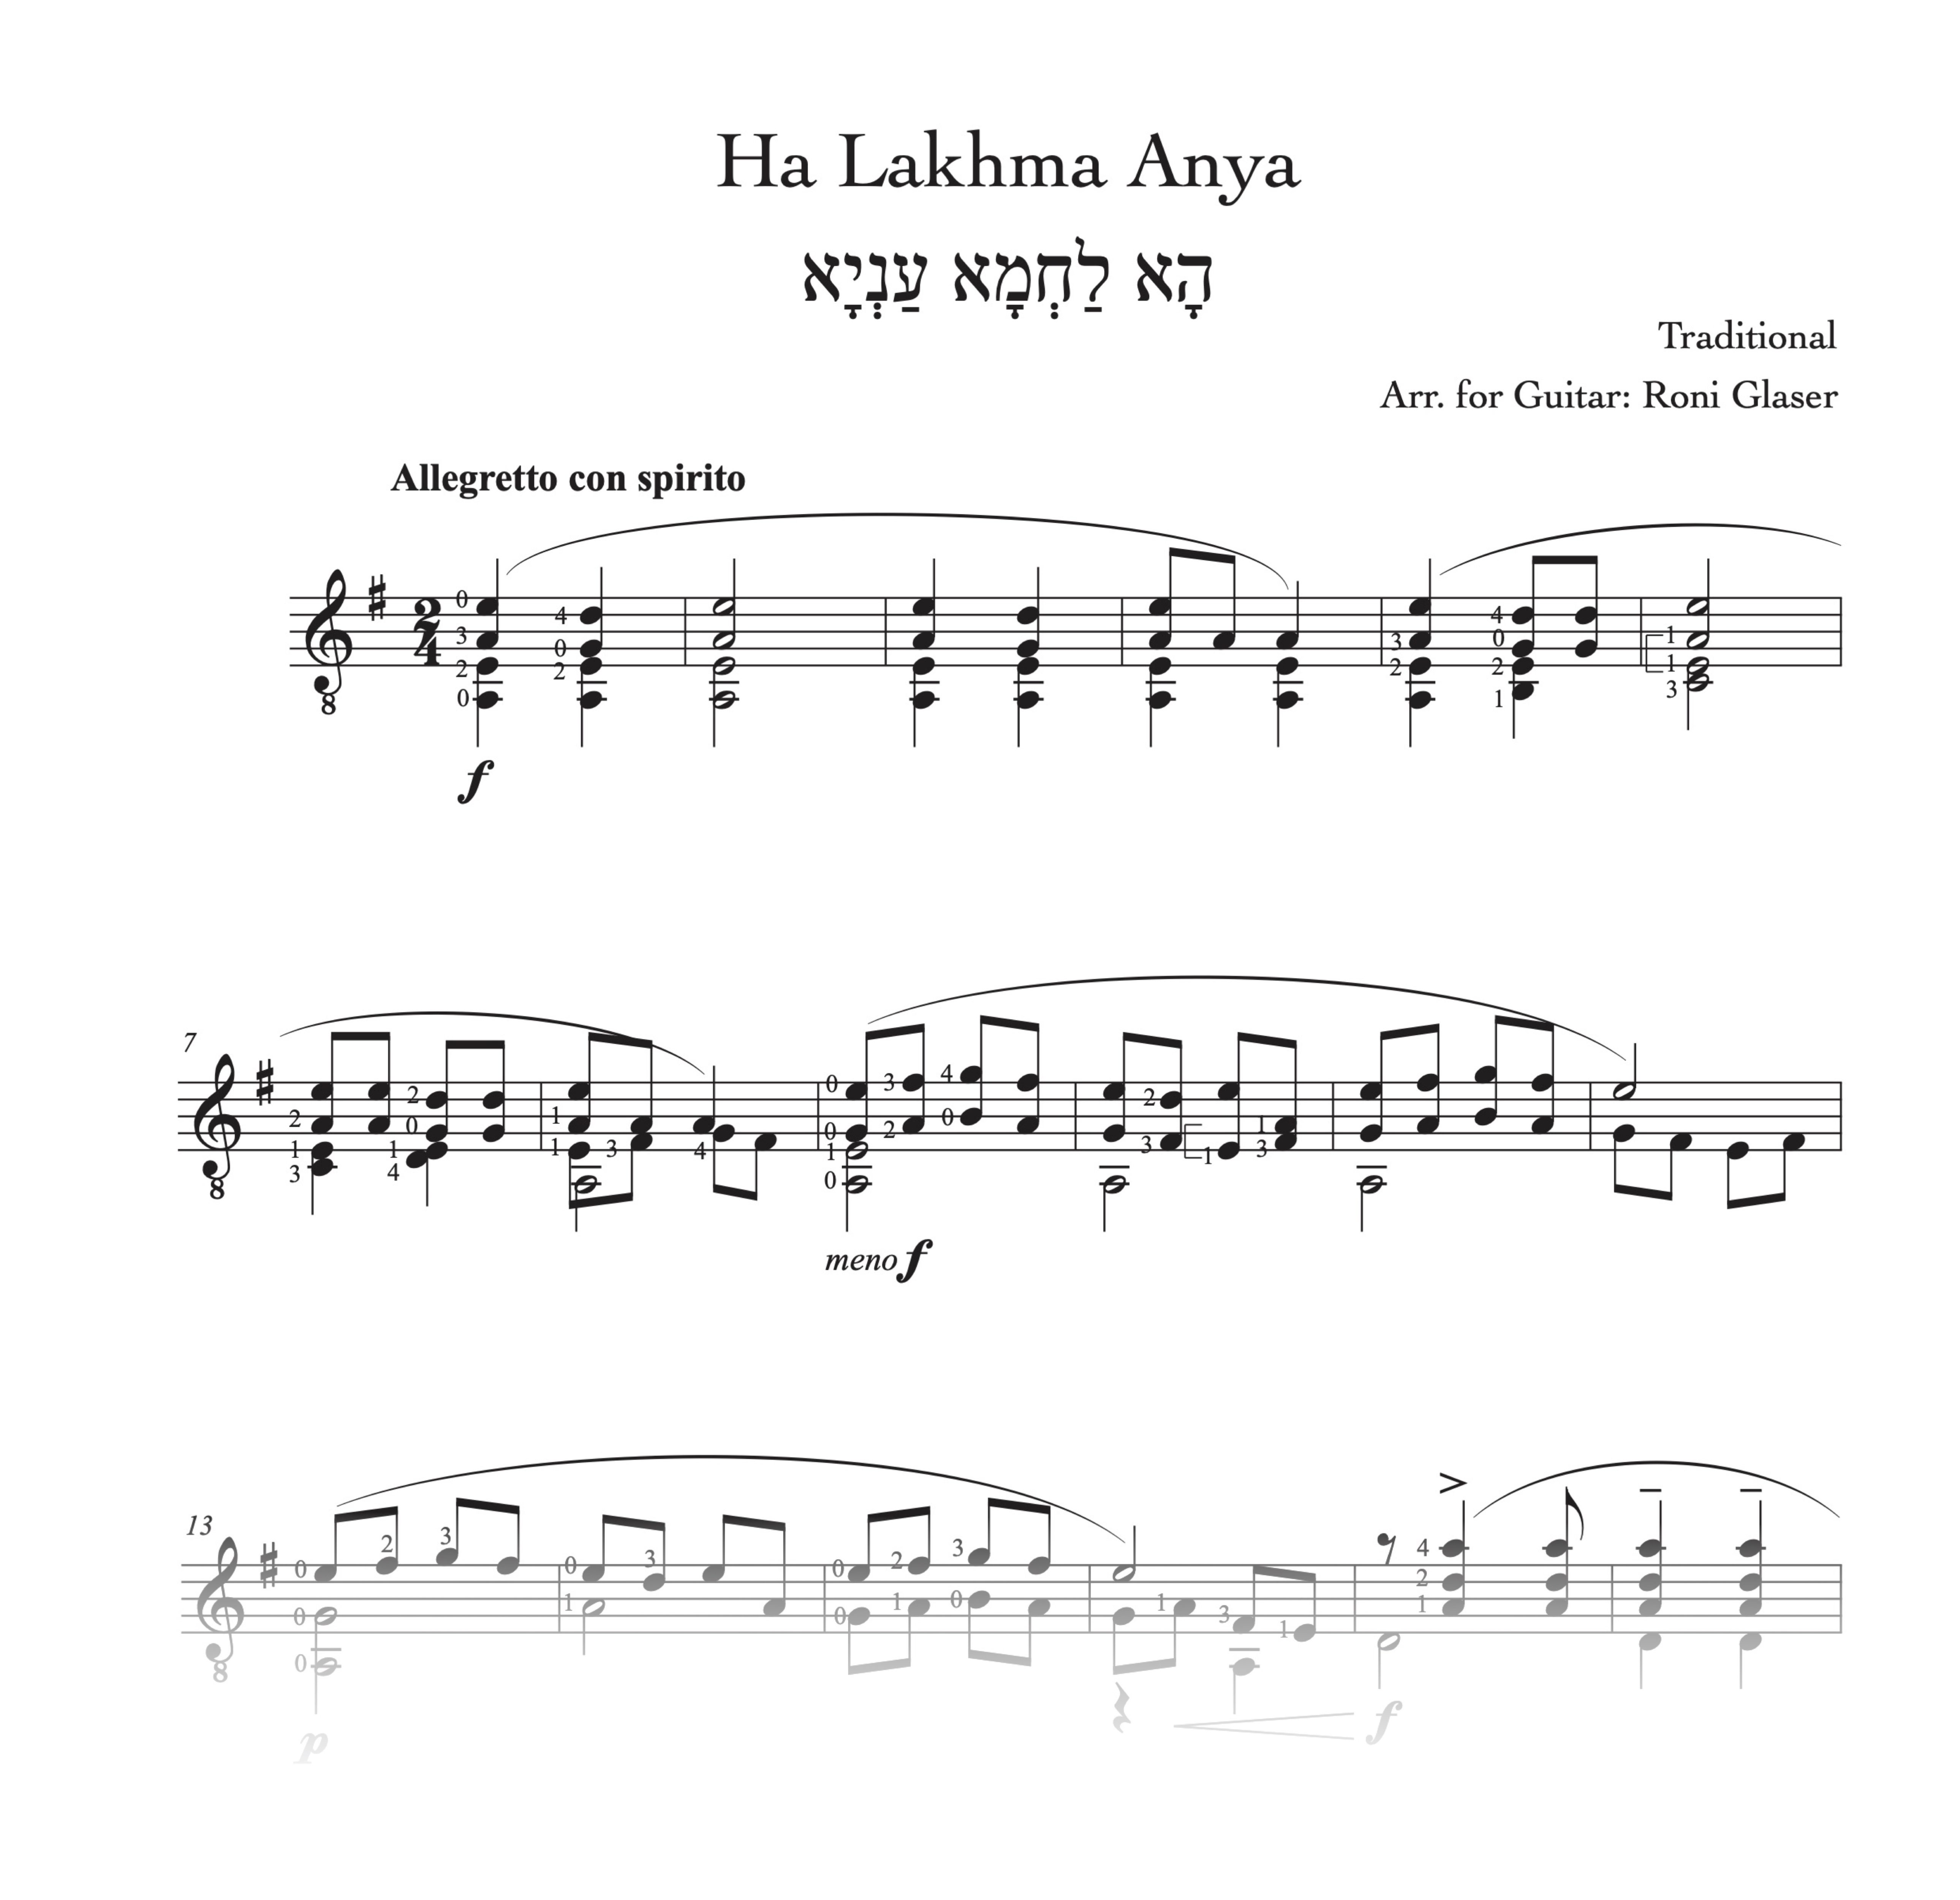 Ha Lakhma Anya Score